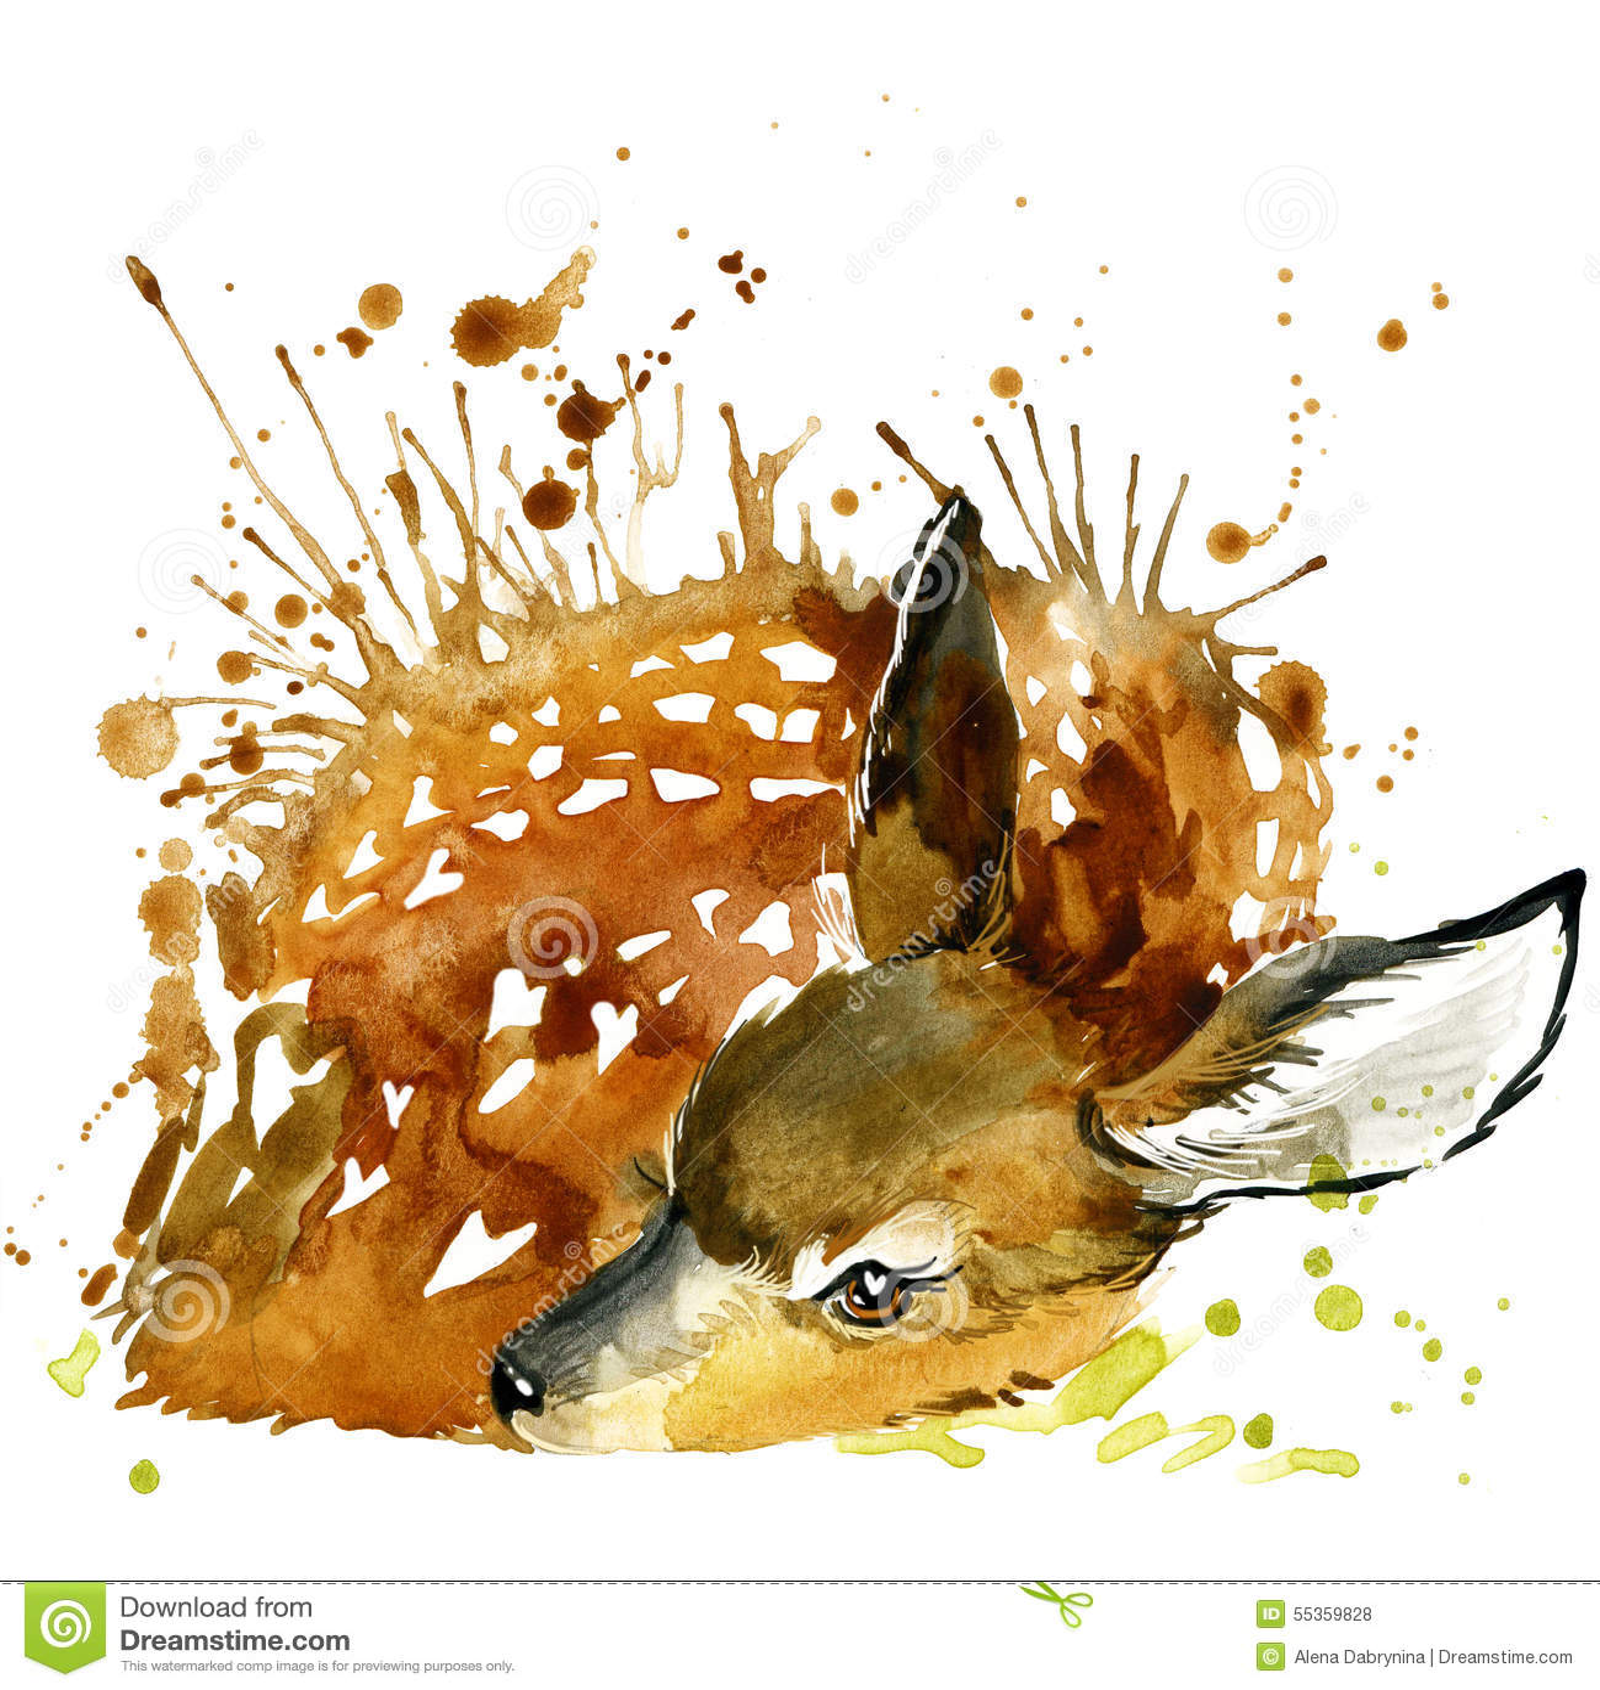 Deer T-shirt graphics, deer illustration with splash watercolor textured background.